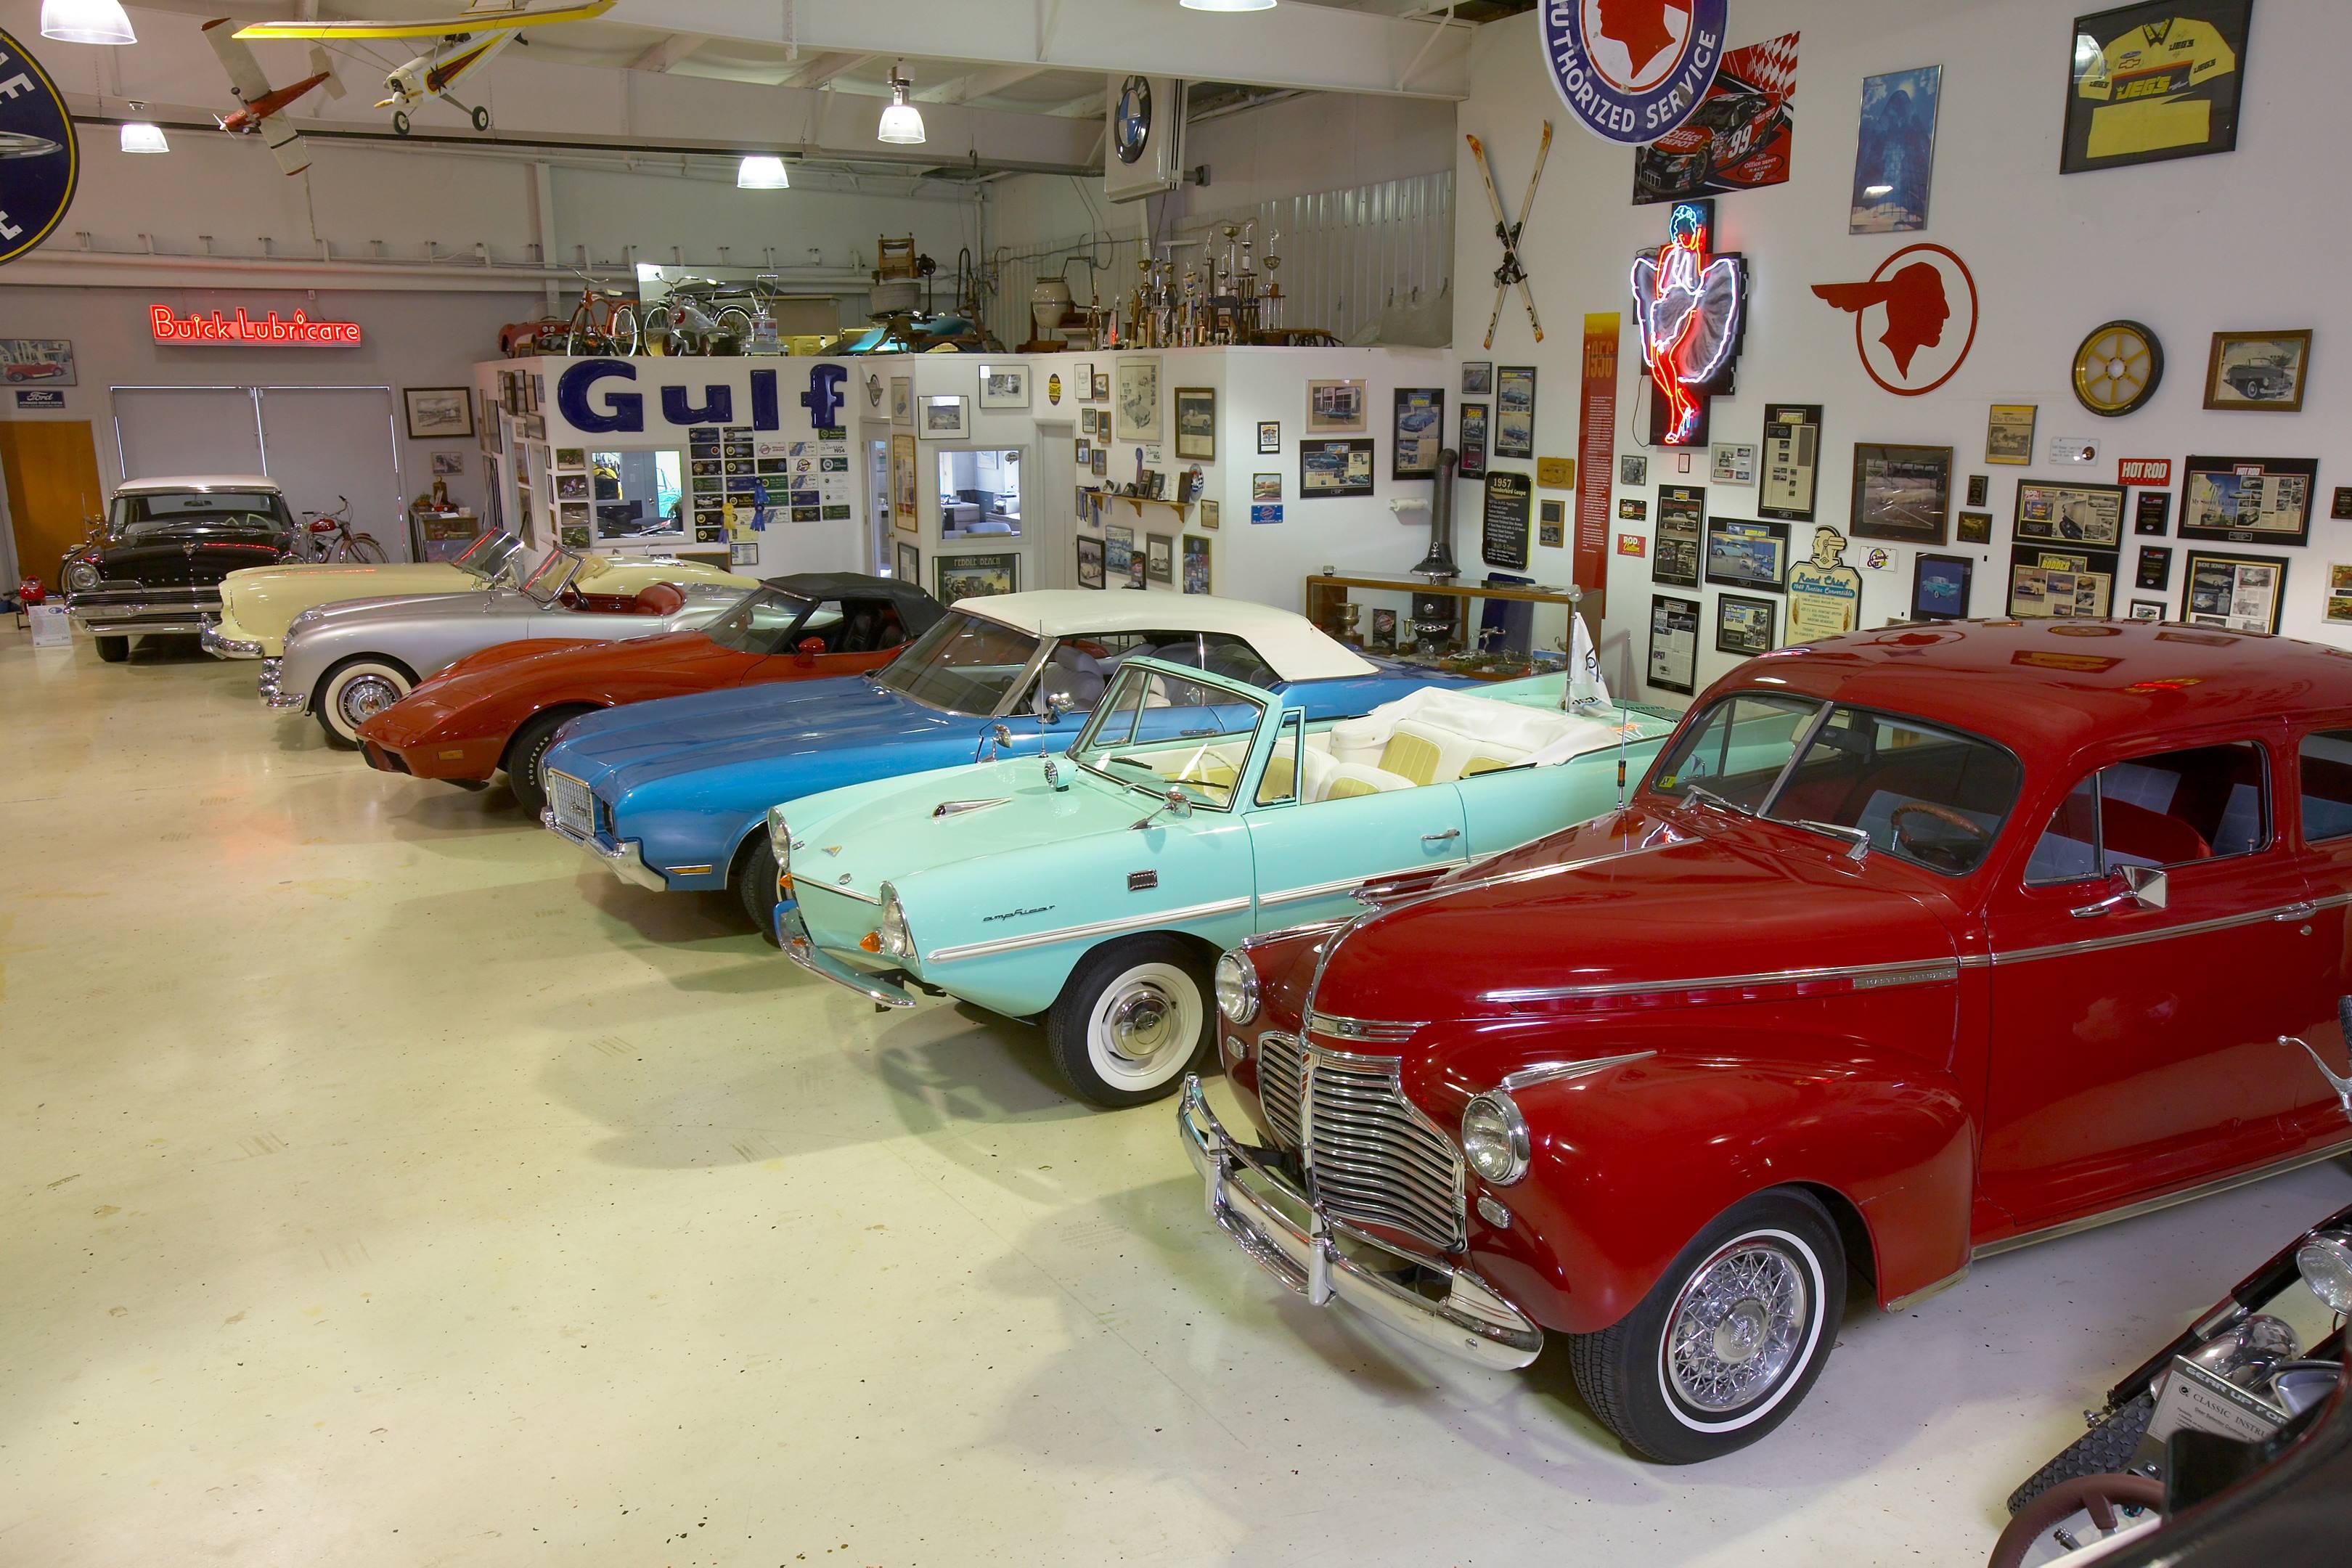 Cars in a Garage